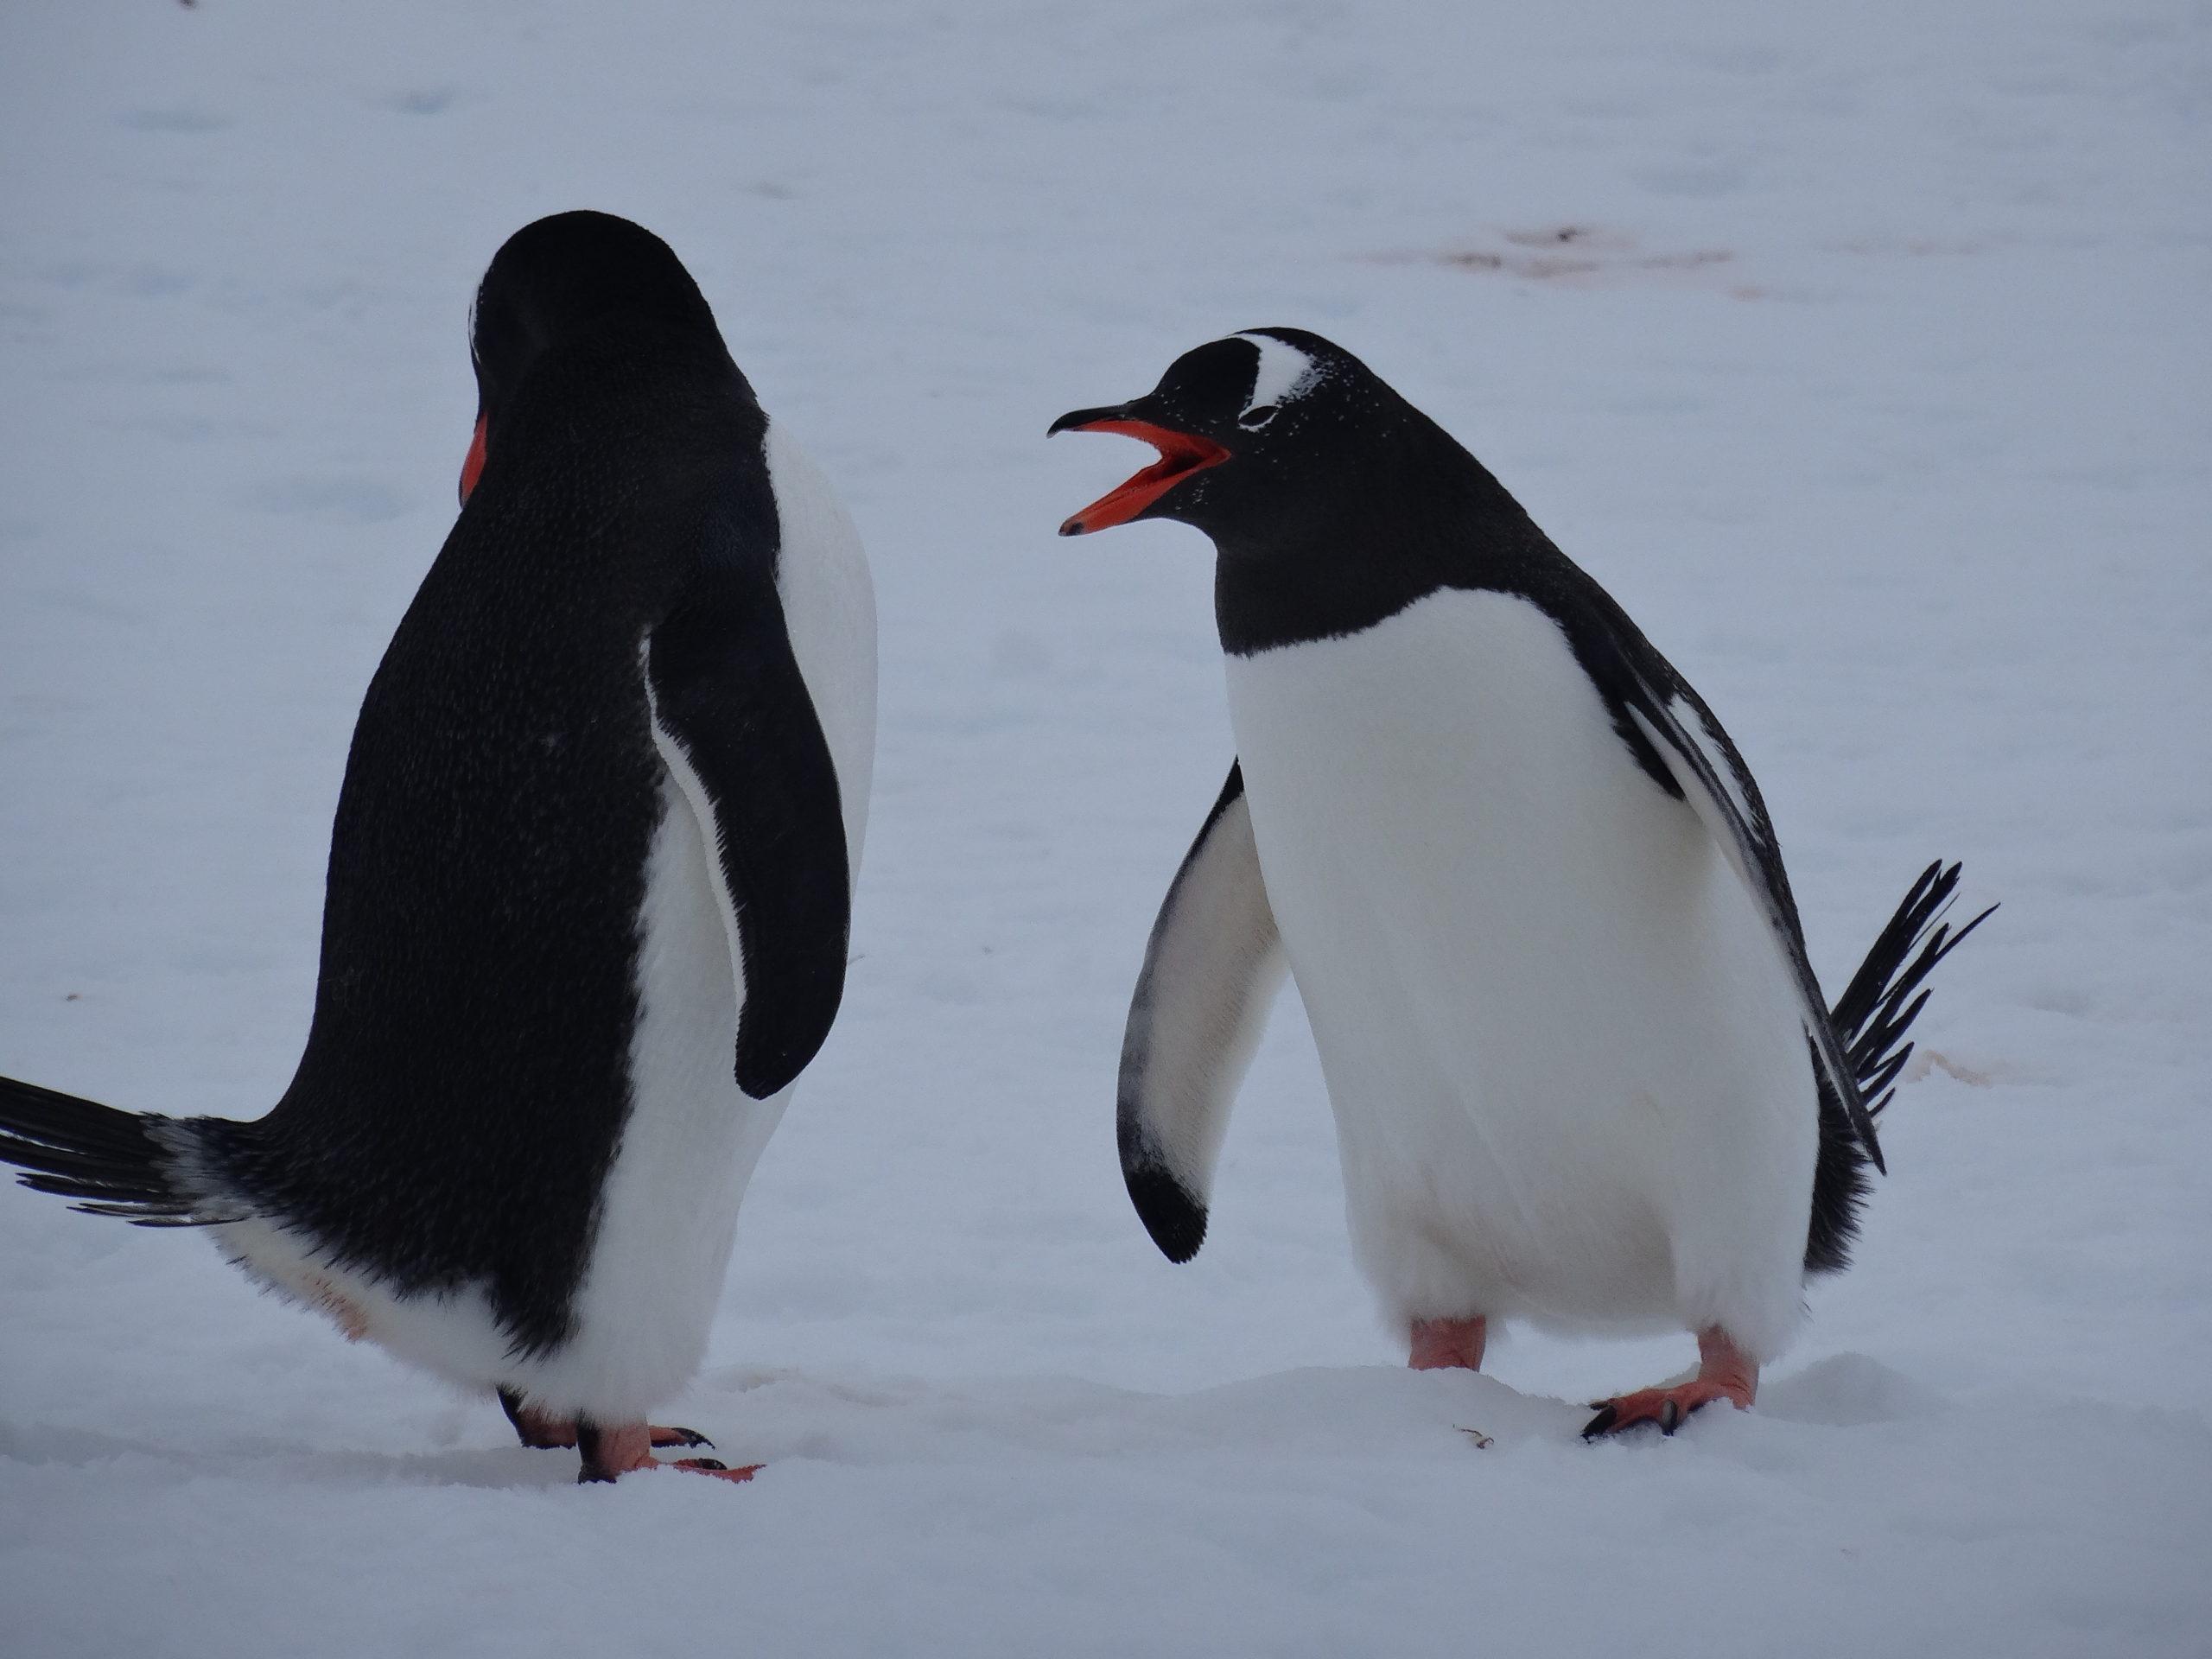 Heliski-Russia-Antarctique-3-scaled